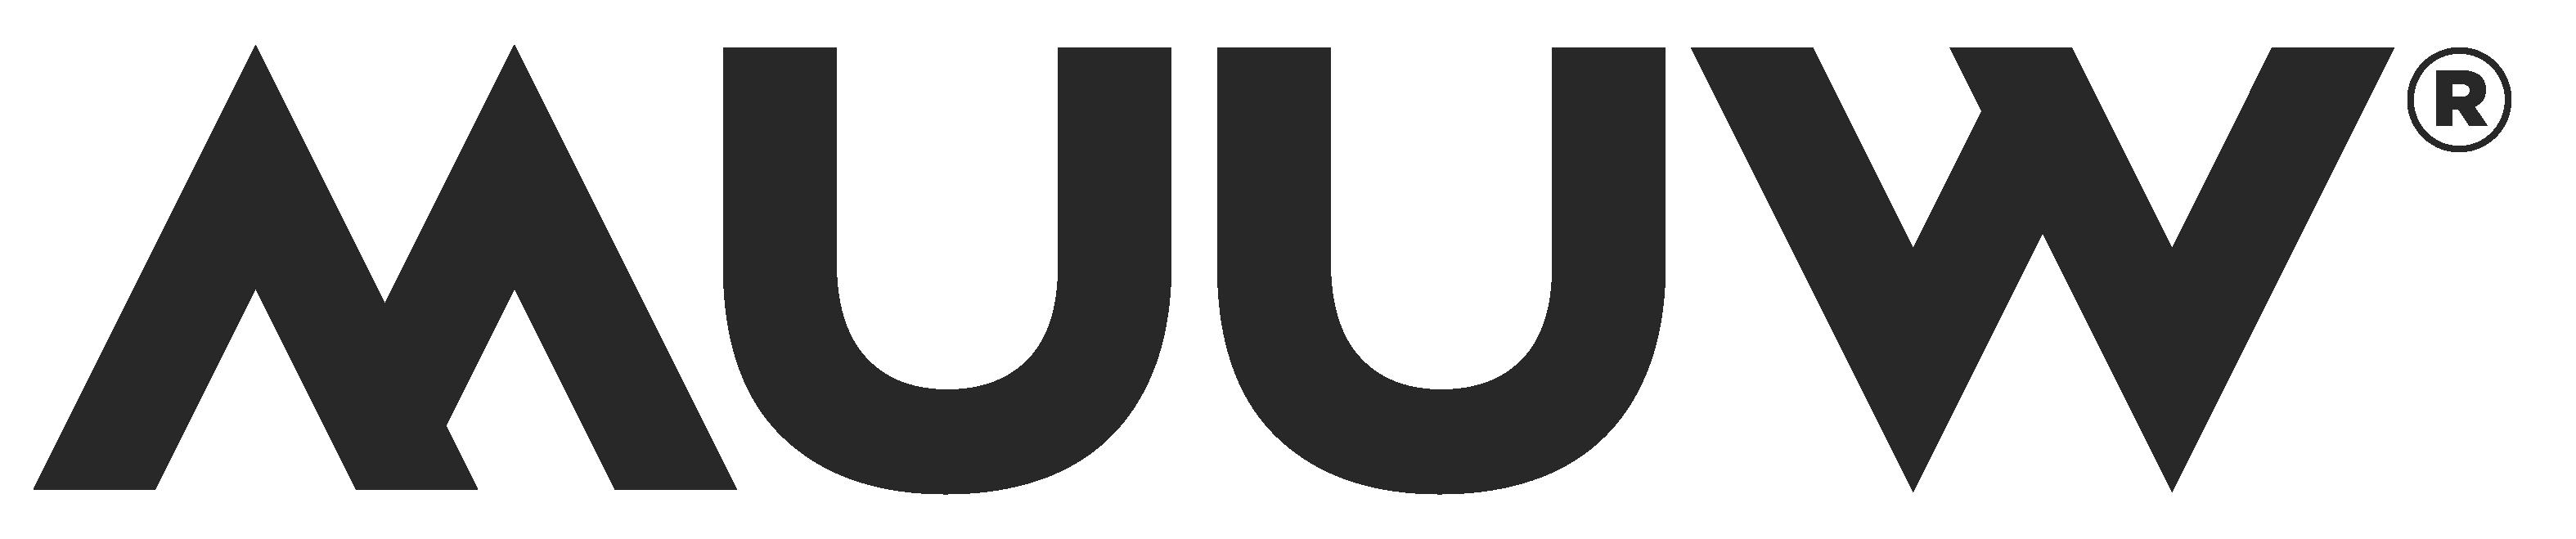 muuw_main_logo_blk-10